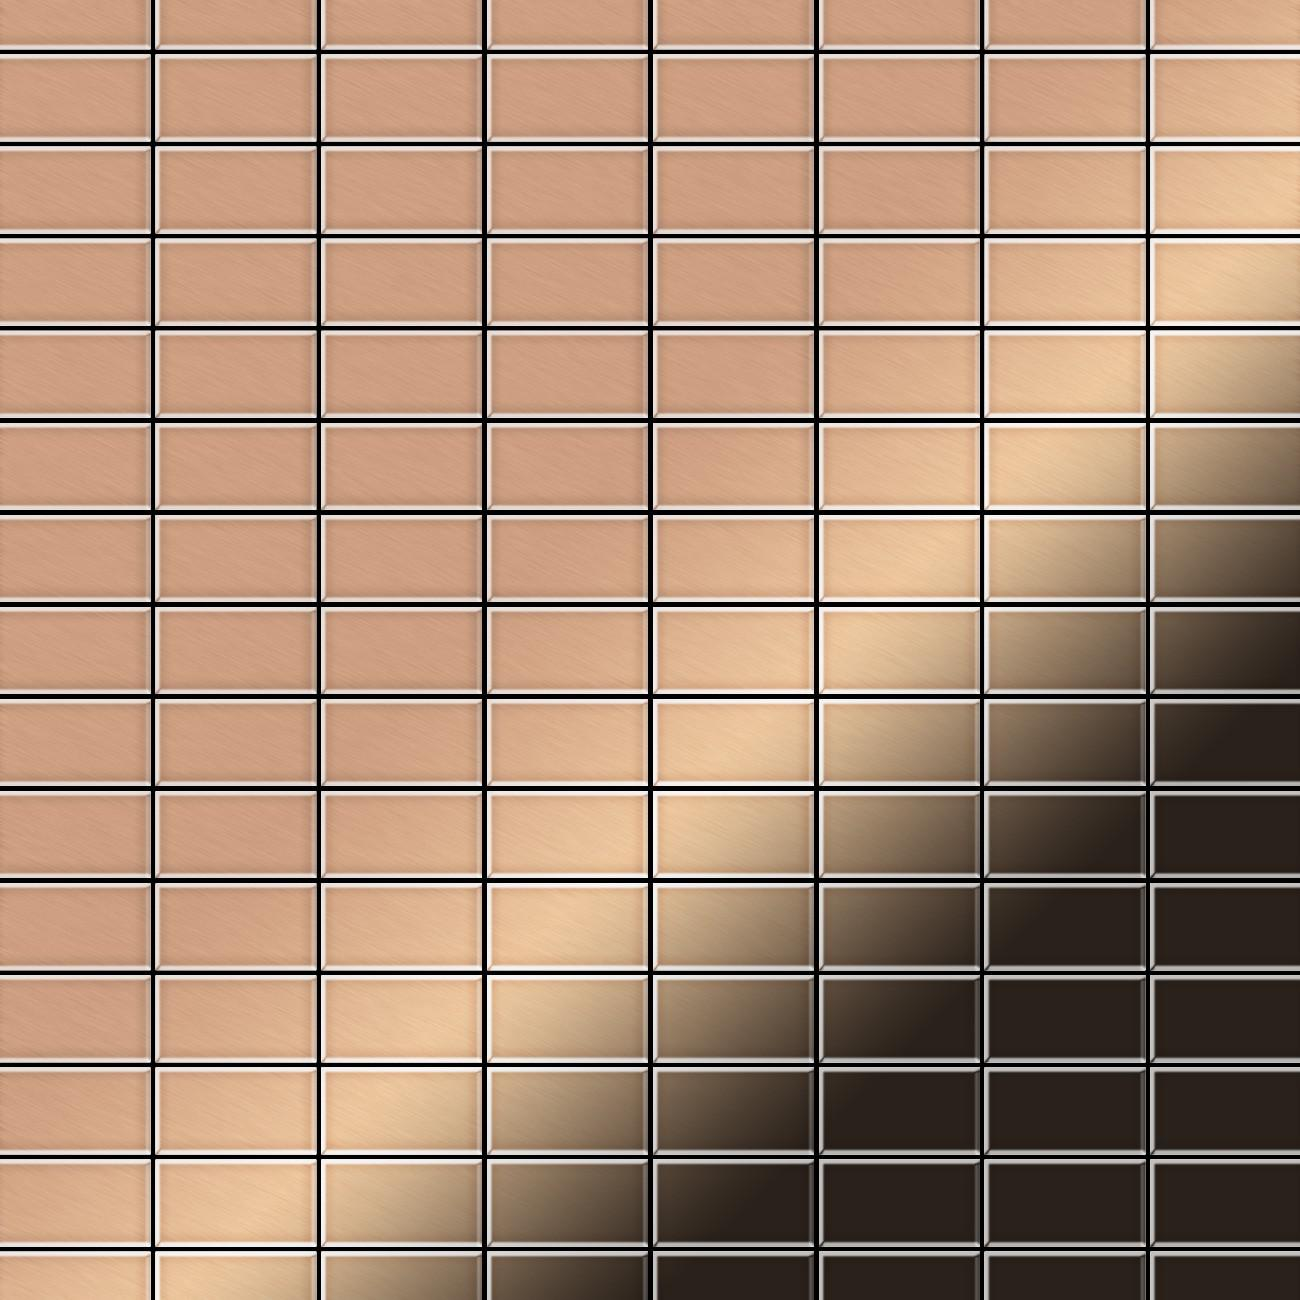 Mosaik fliese massiv metall kupfer gewalzt in kupfer 1 6mm stark alloy bauhaus cm 1 05 m2 - Mosaik fliesen bauhaus ...